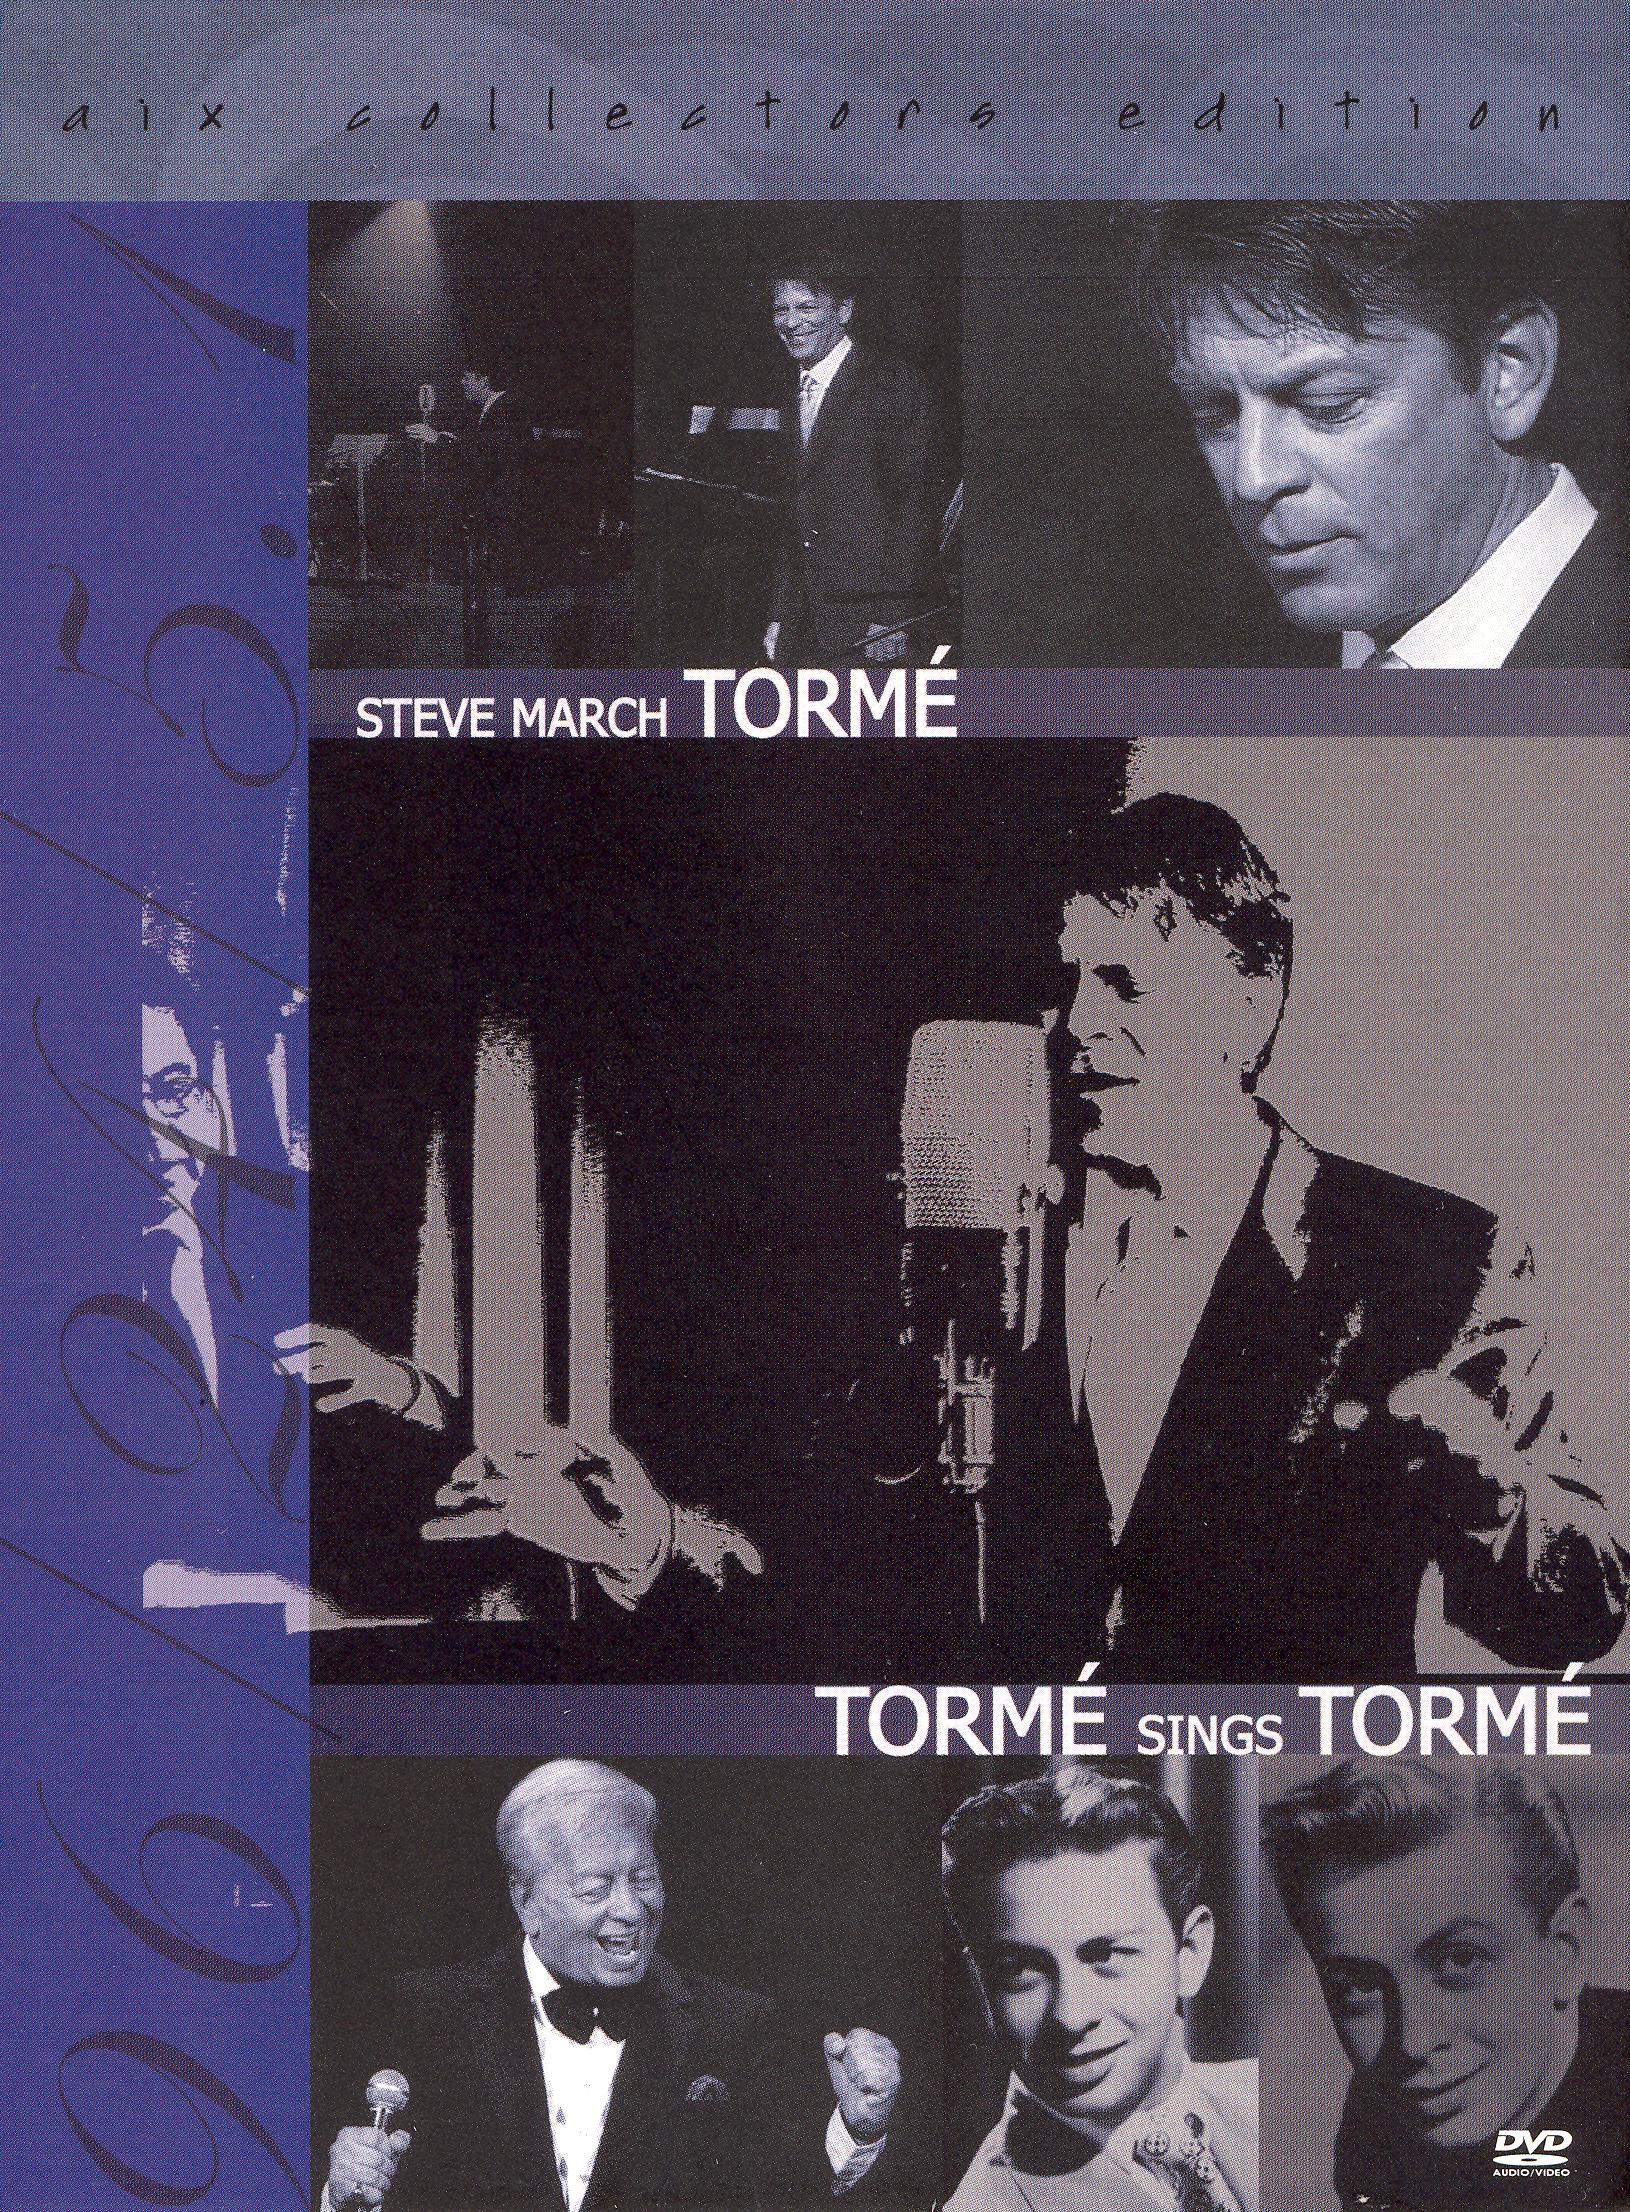 Steve March Tormé: Tormé Sings Tormé